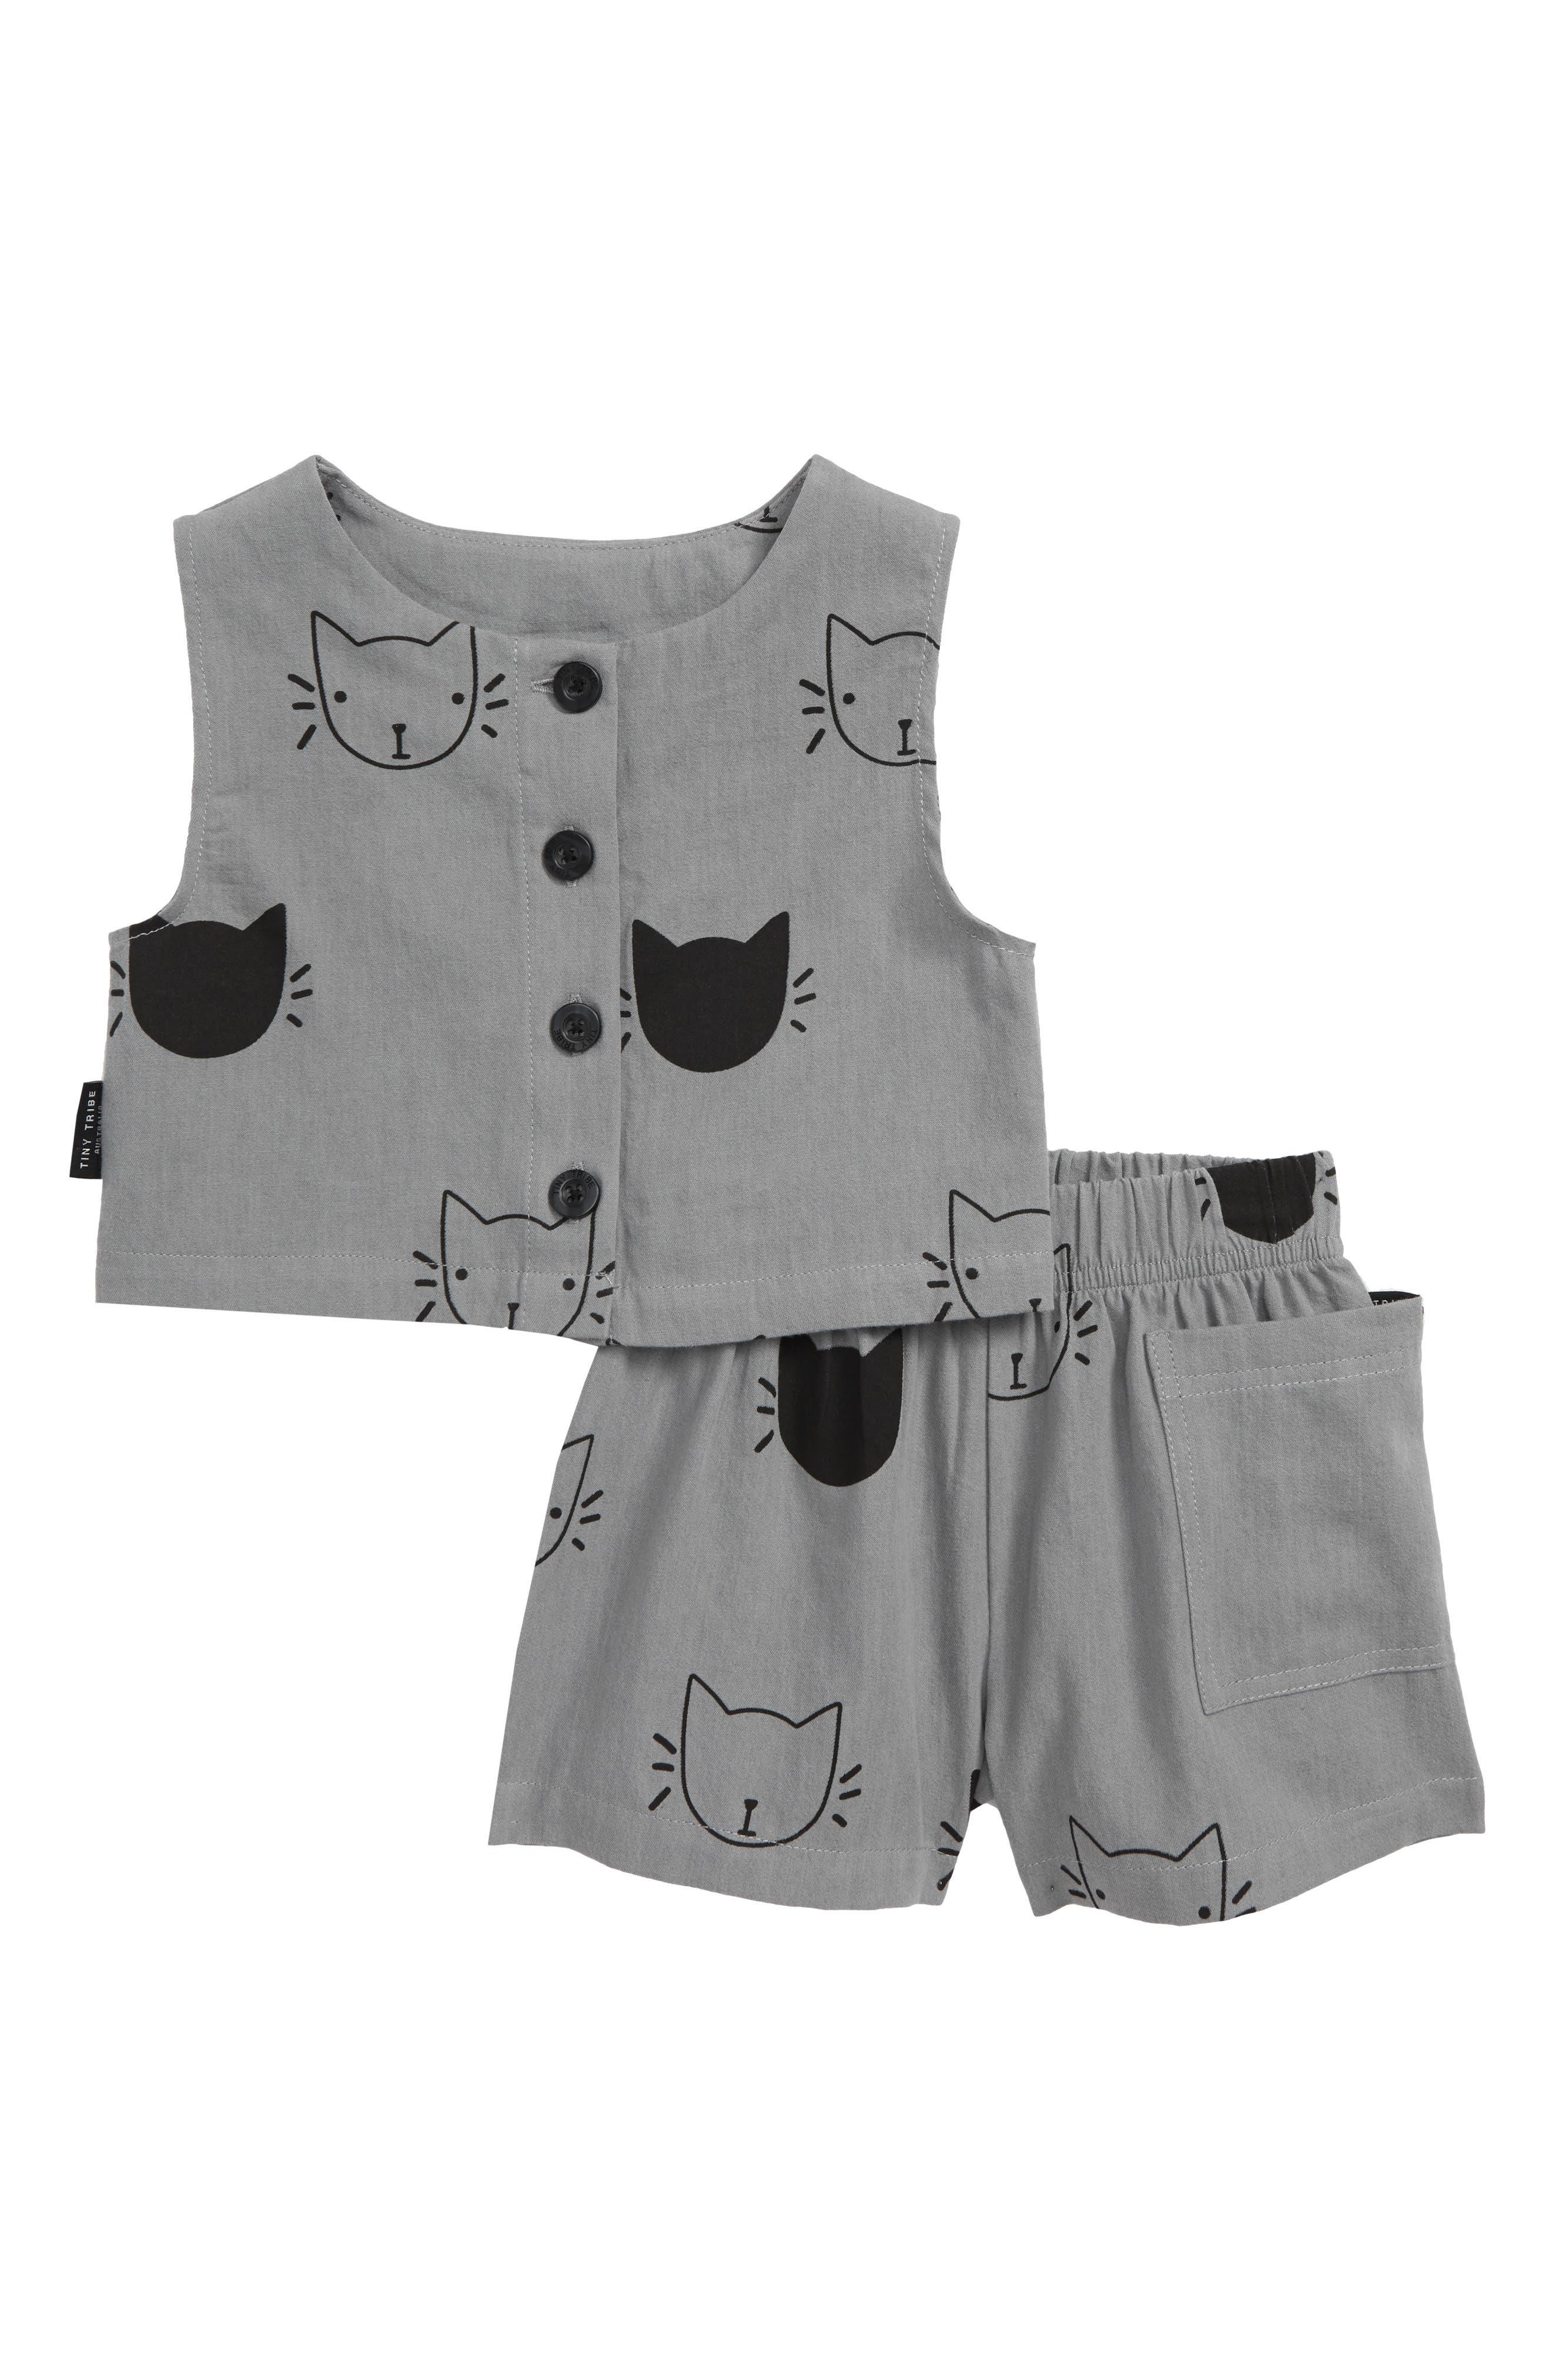 Toddler Girls Tiny Tribe Starcat Top  Shorts Set